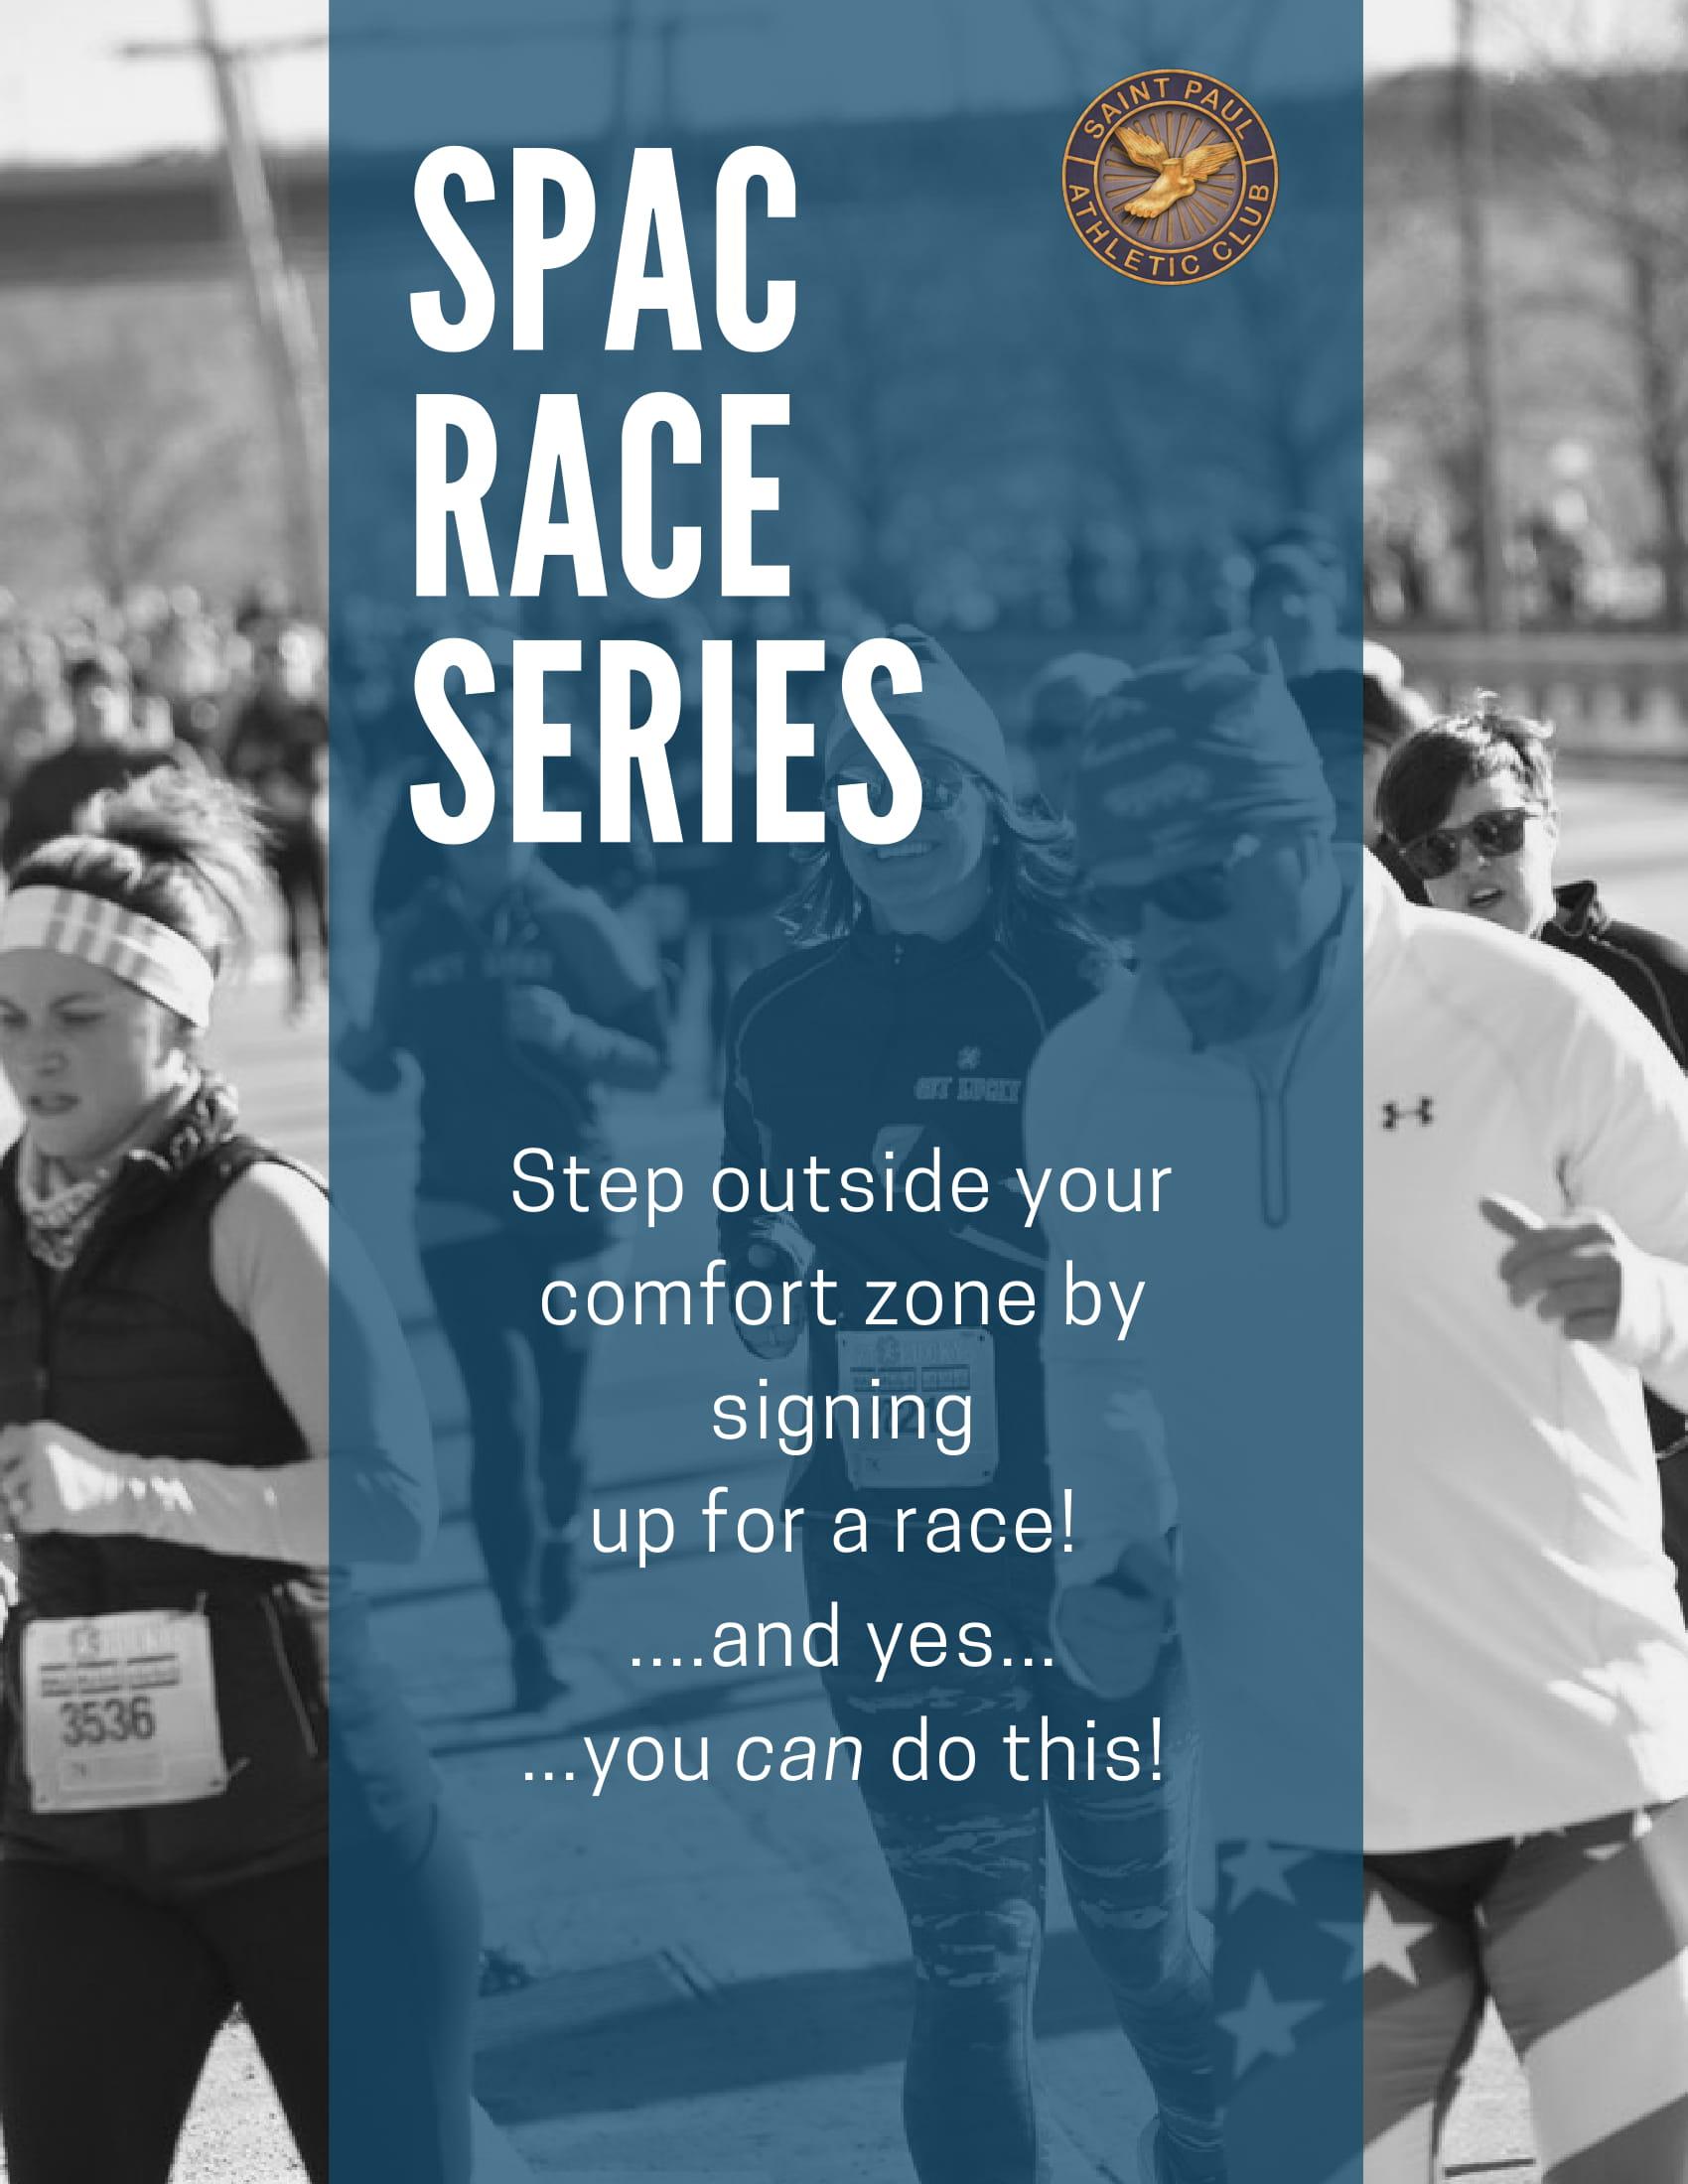 SPAC Race Series